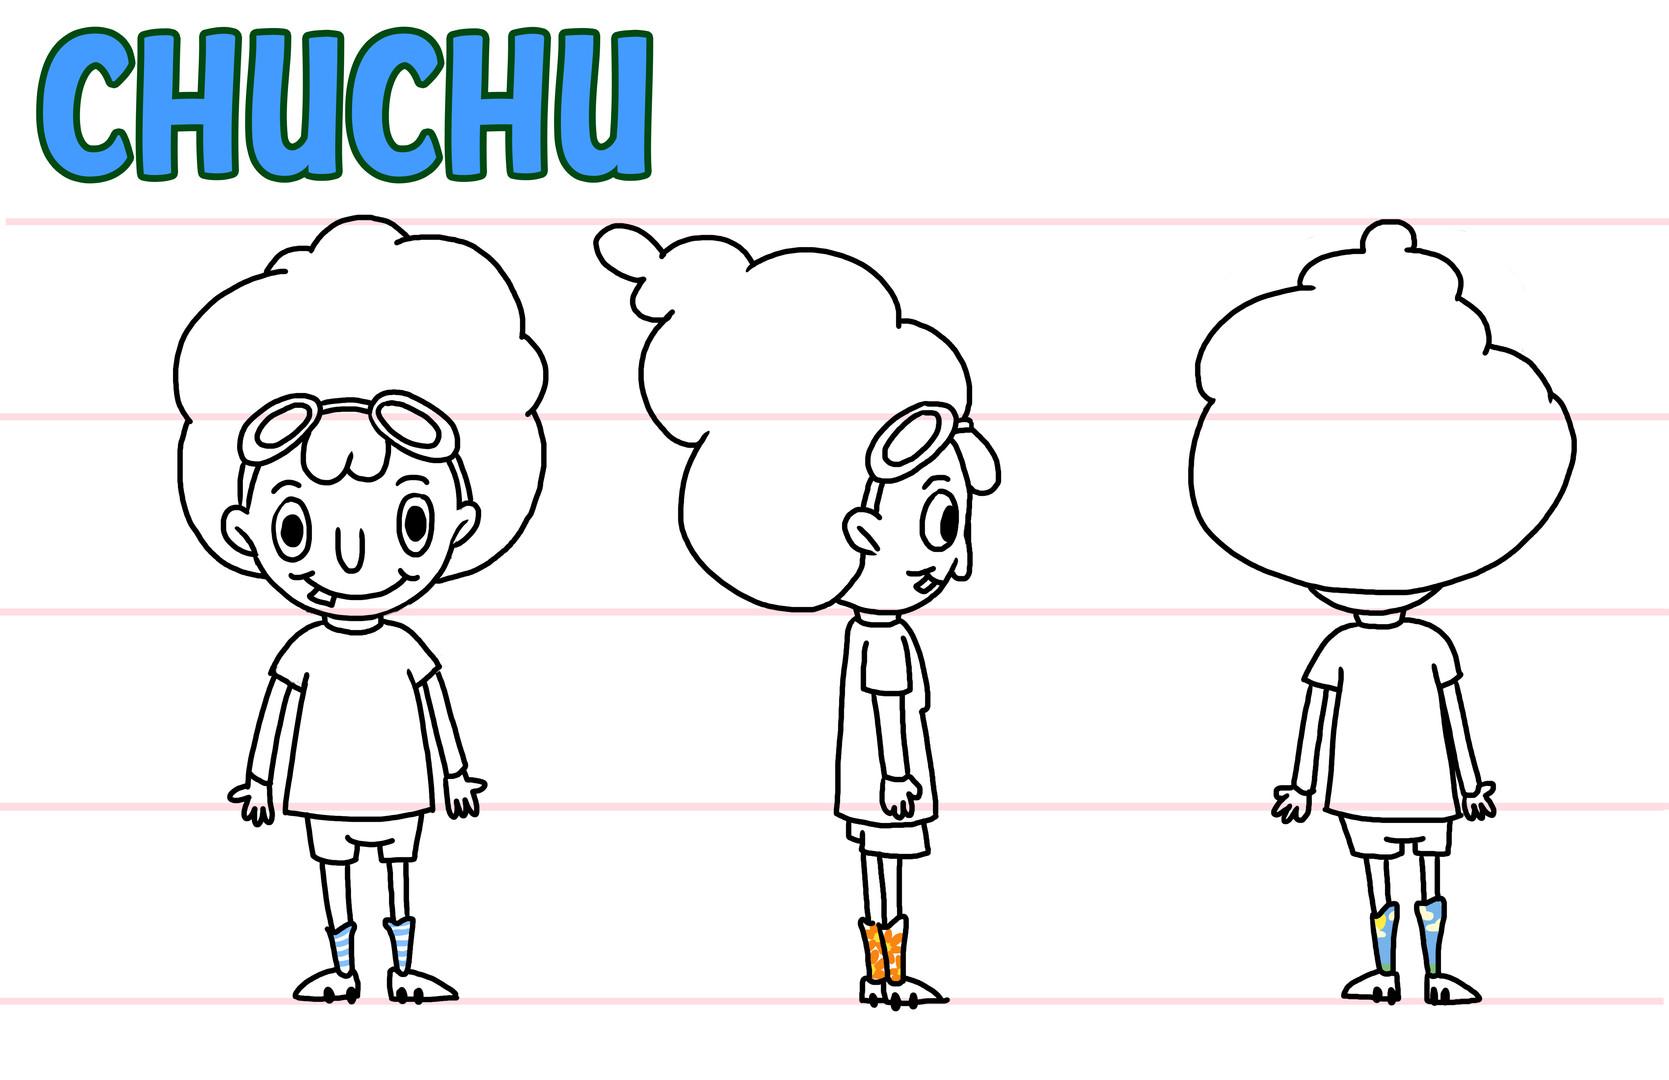 ChuChu Front, Side, Back.jpg